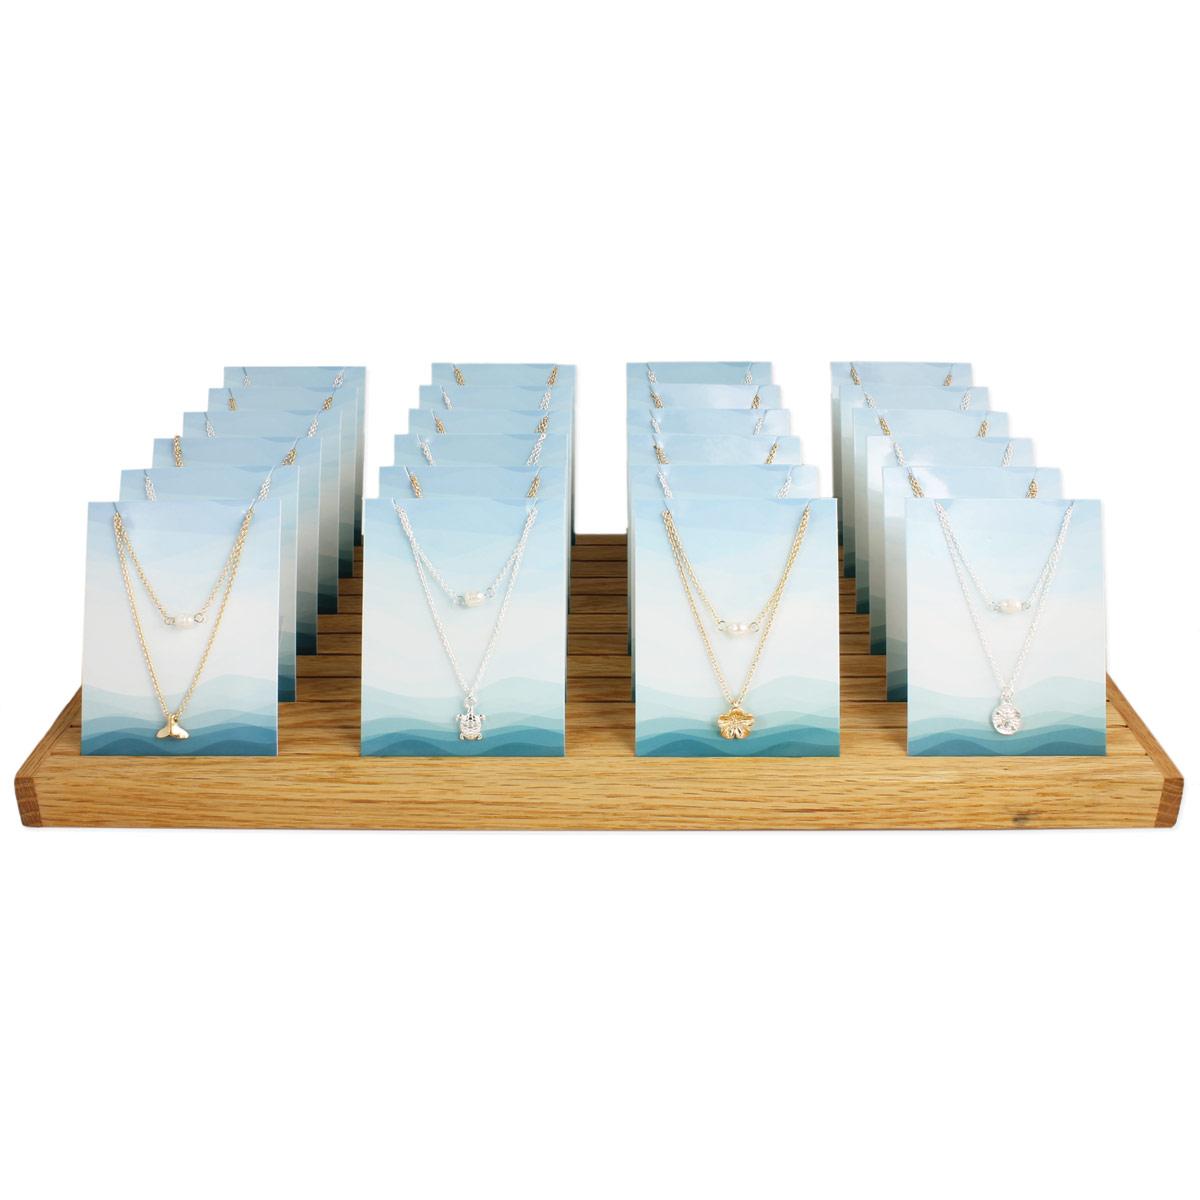 Ocean Necklaces in Wood Counter Display